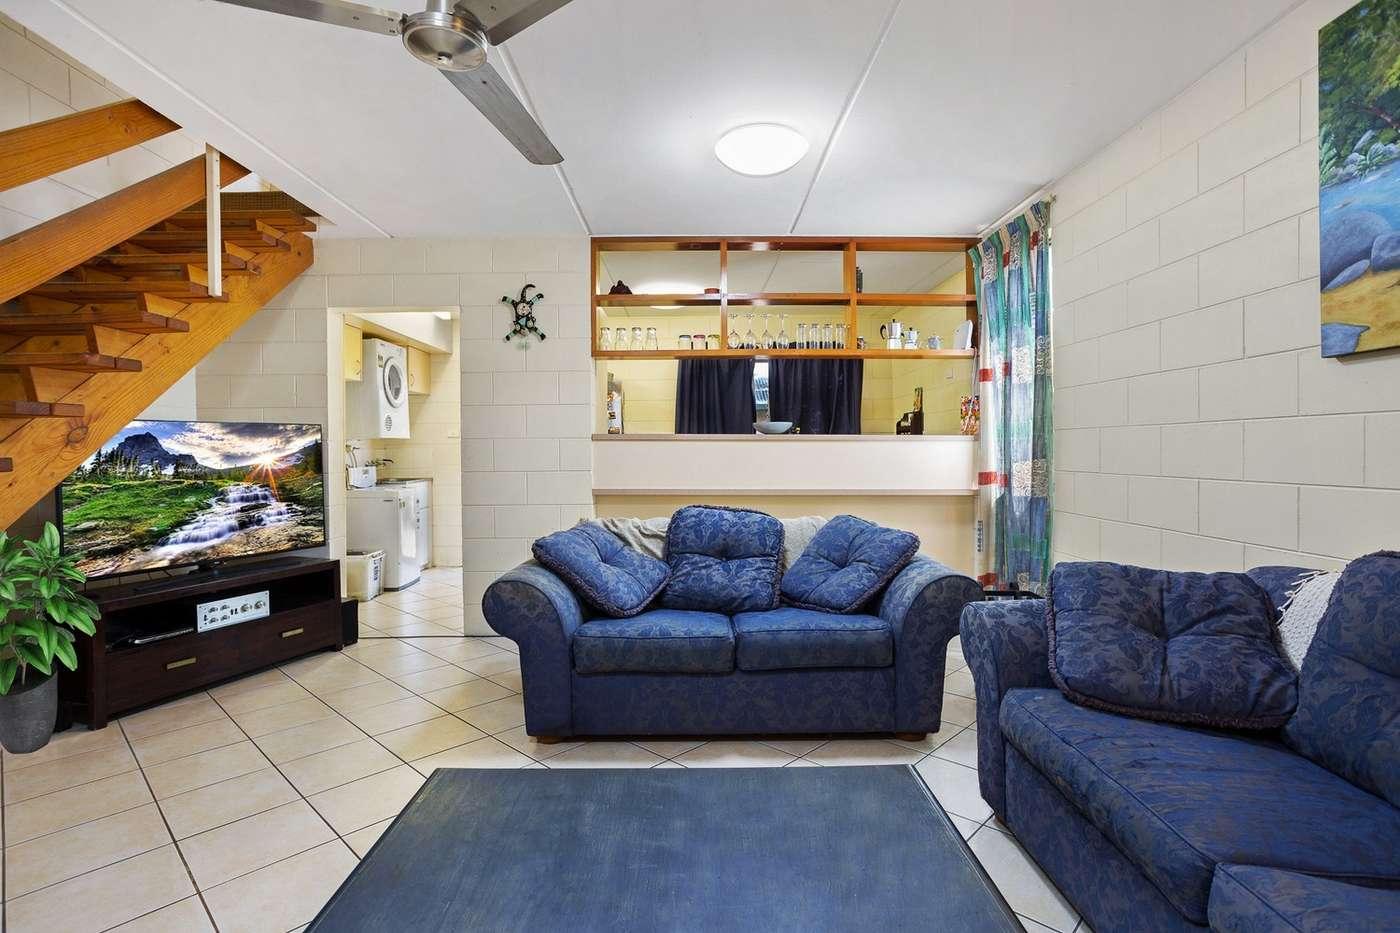 Main view of Homely apartment listing, 2/49-53 English Street, Manunda, QLD 4870